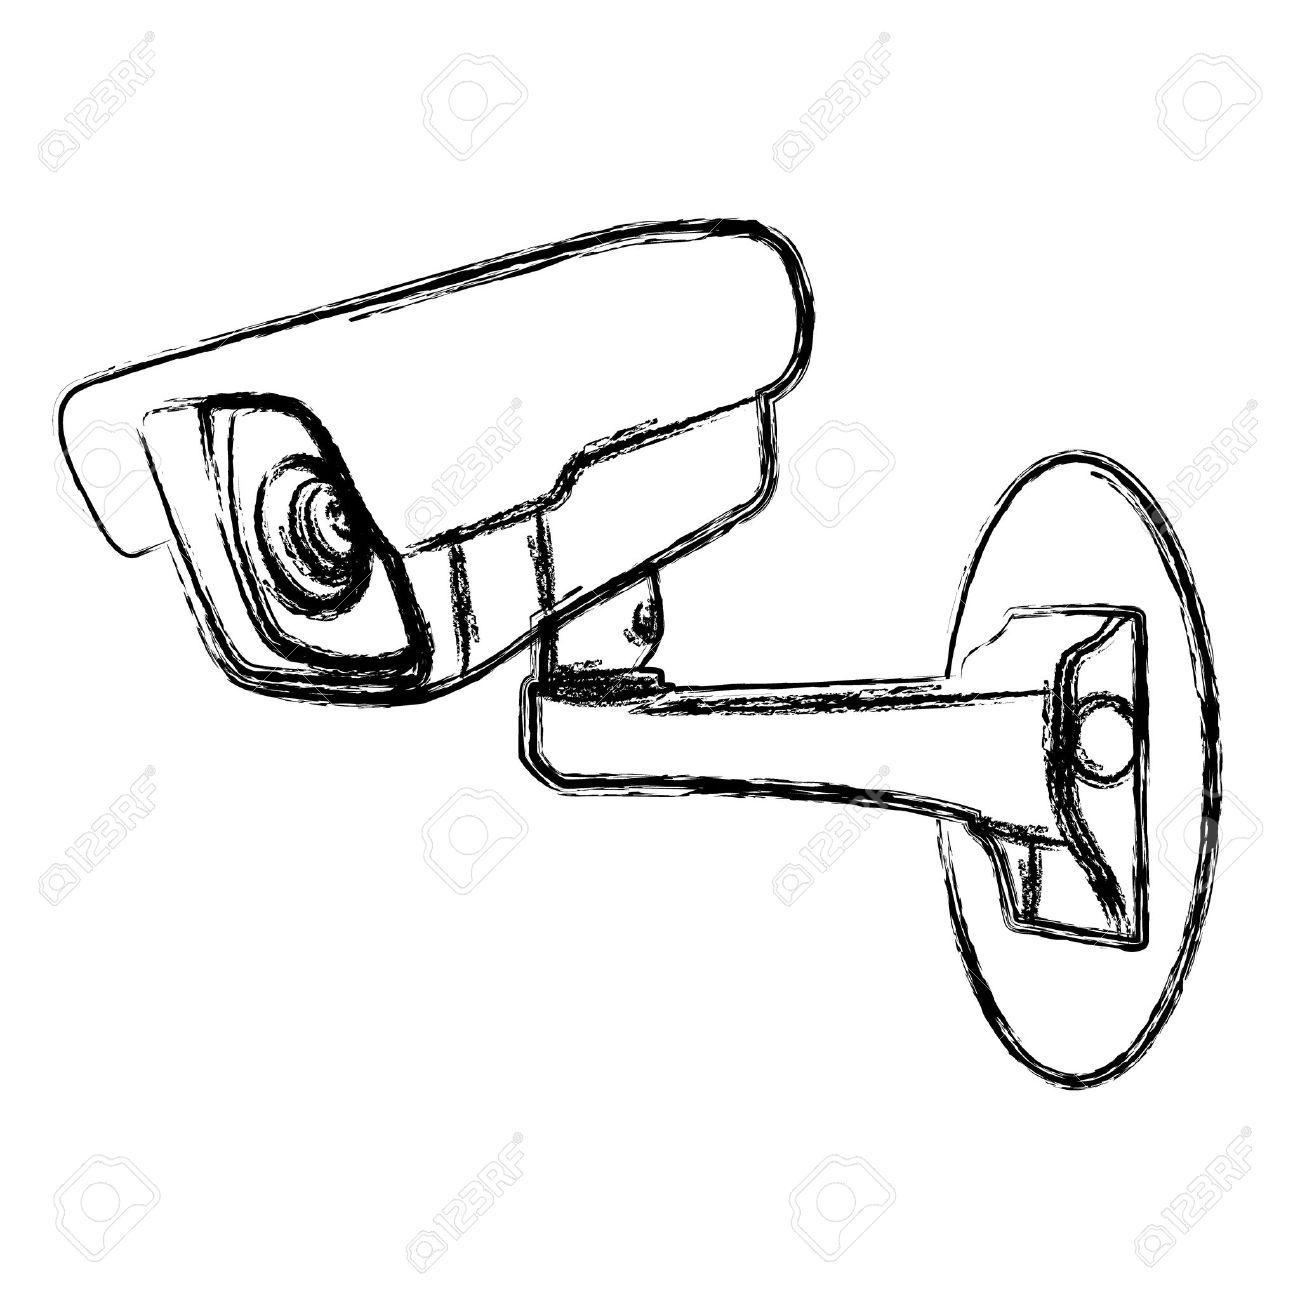 1300x1300 Camera Clipart Cctv Camera